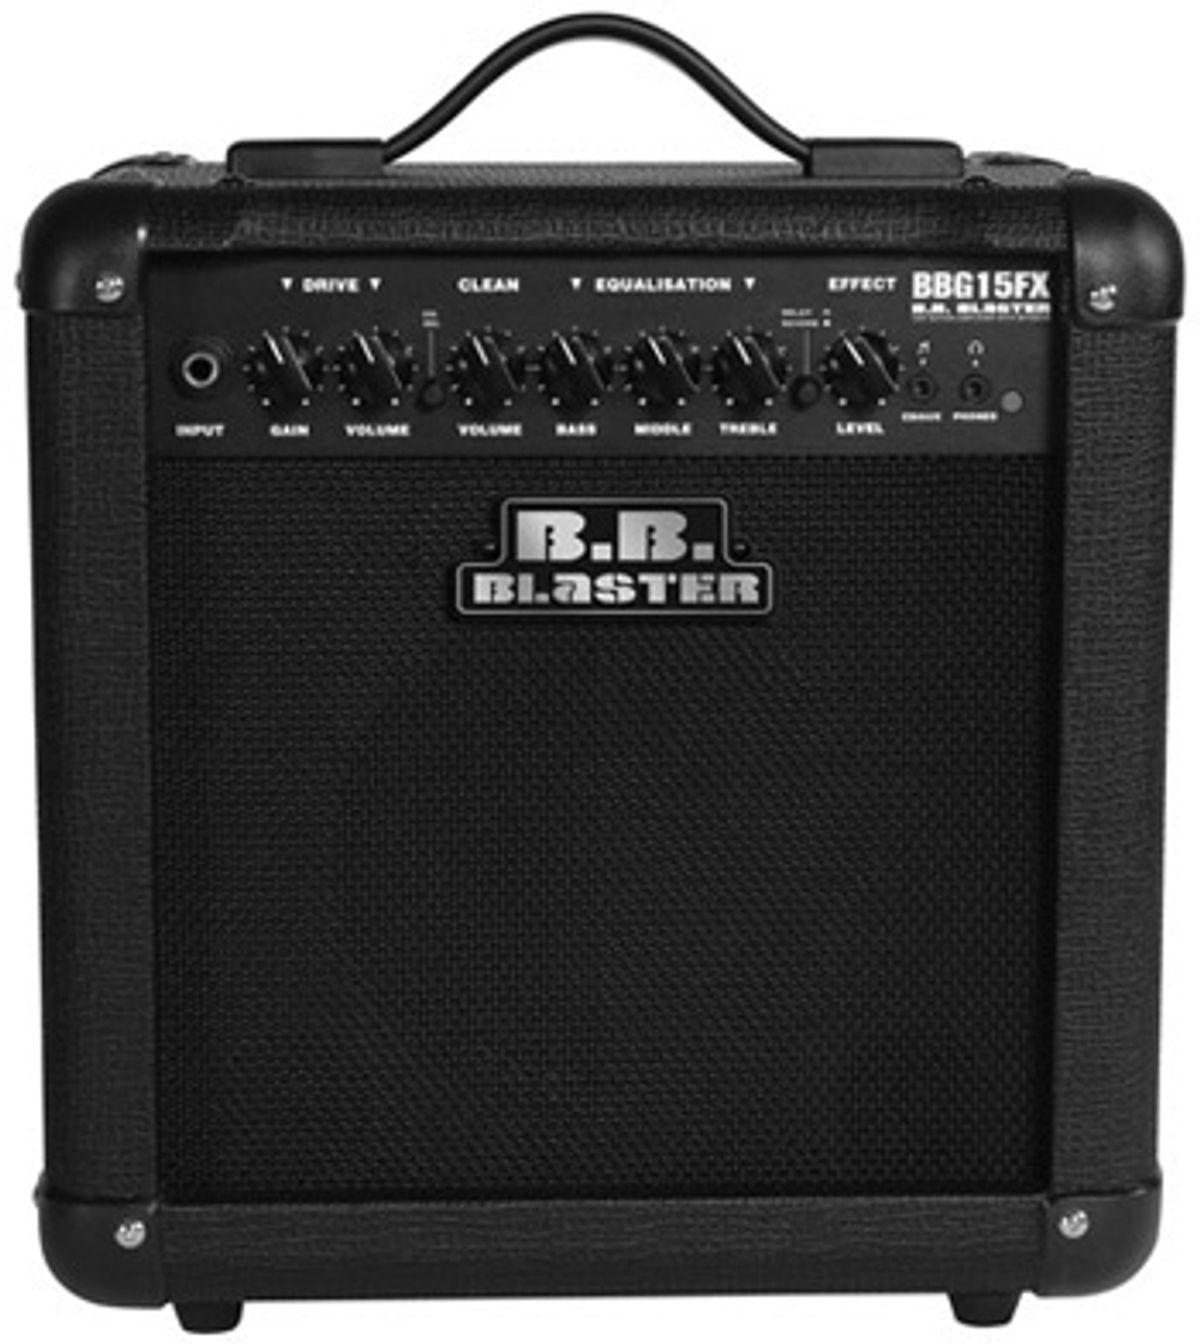 B.B. Blaster Amplification Announces BBG15FX Amp